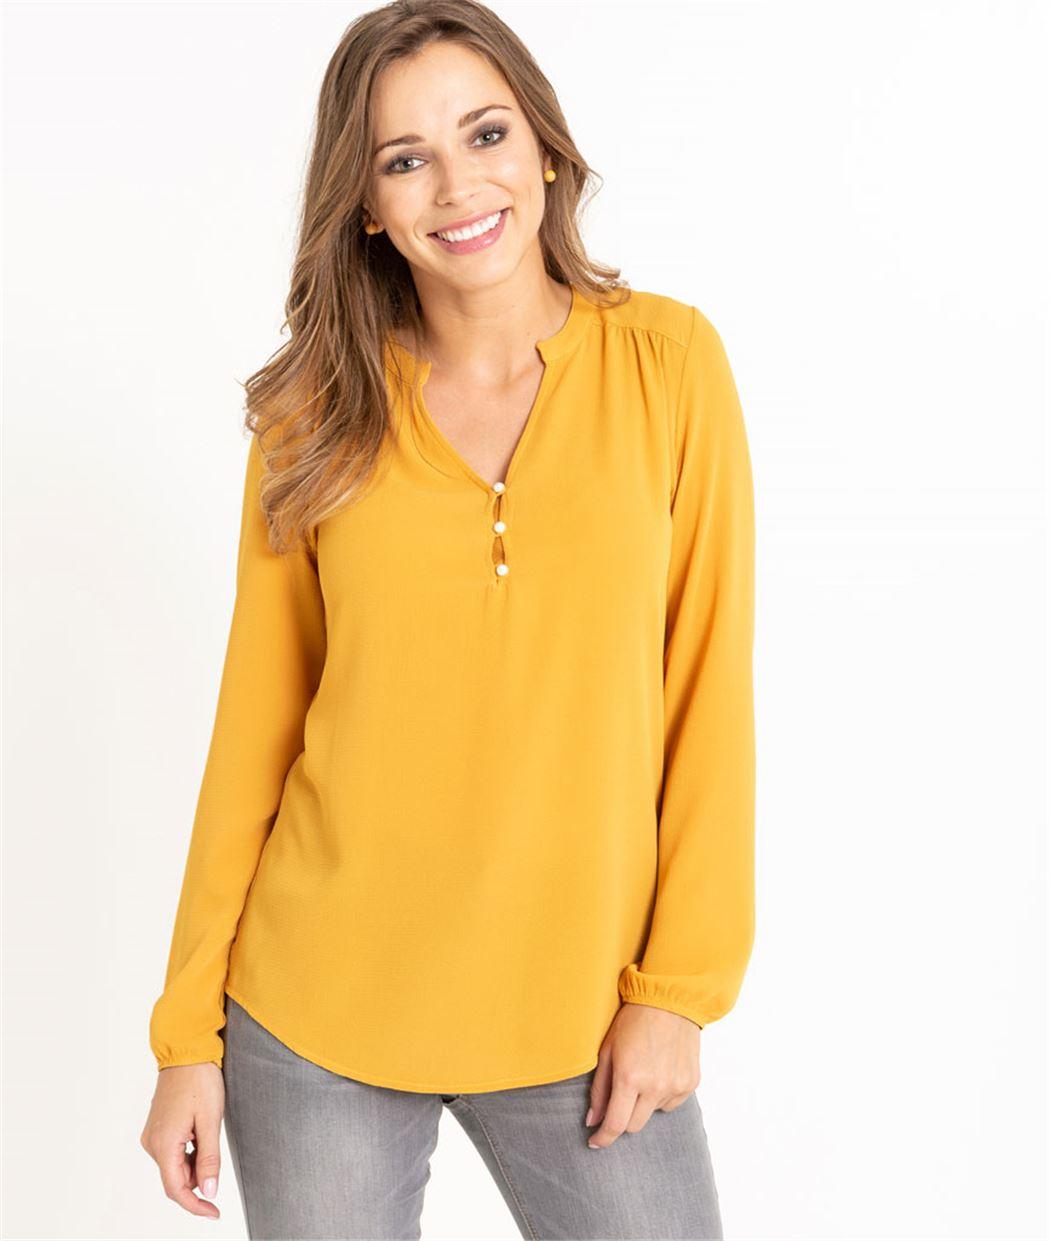 T-shirt femme manches longues SAFRAN